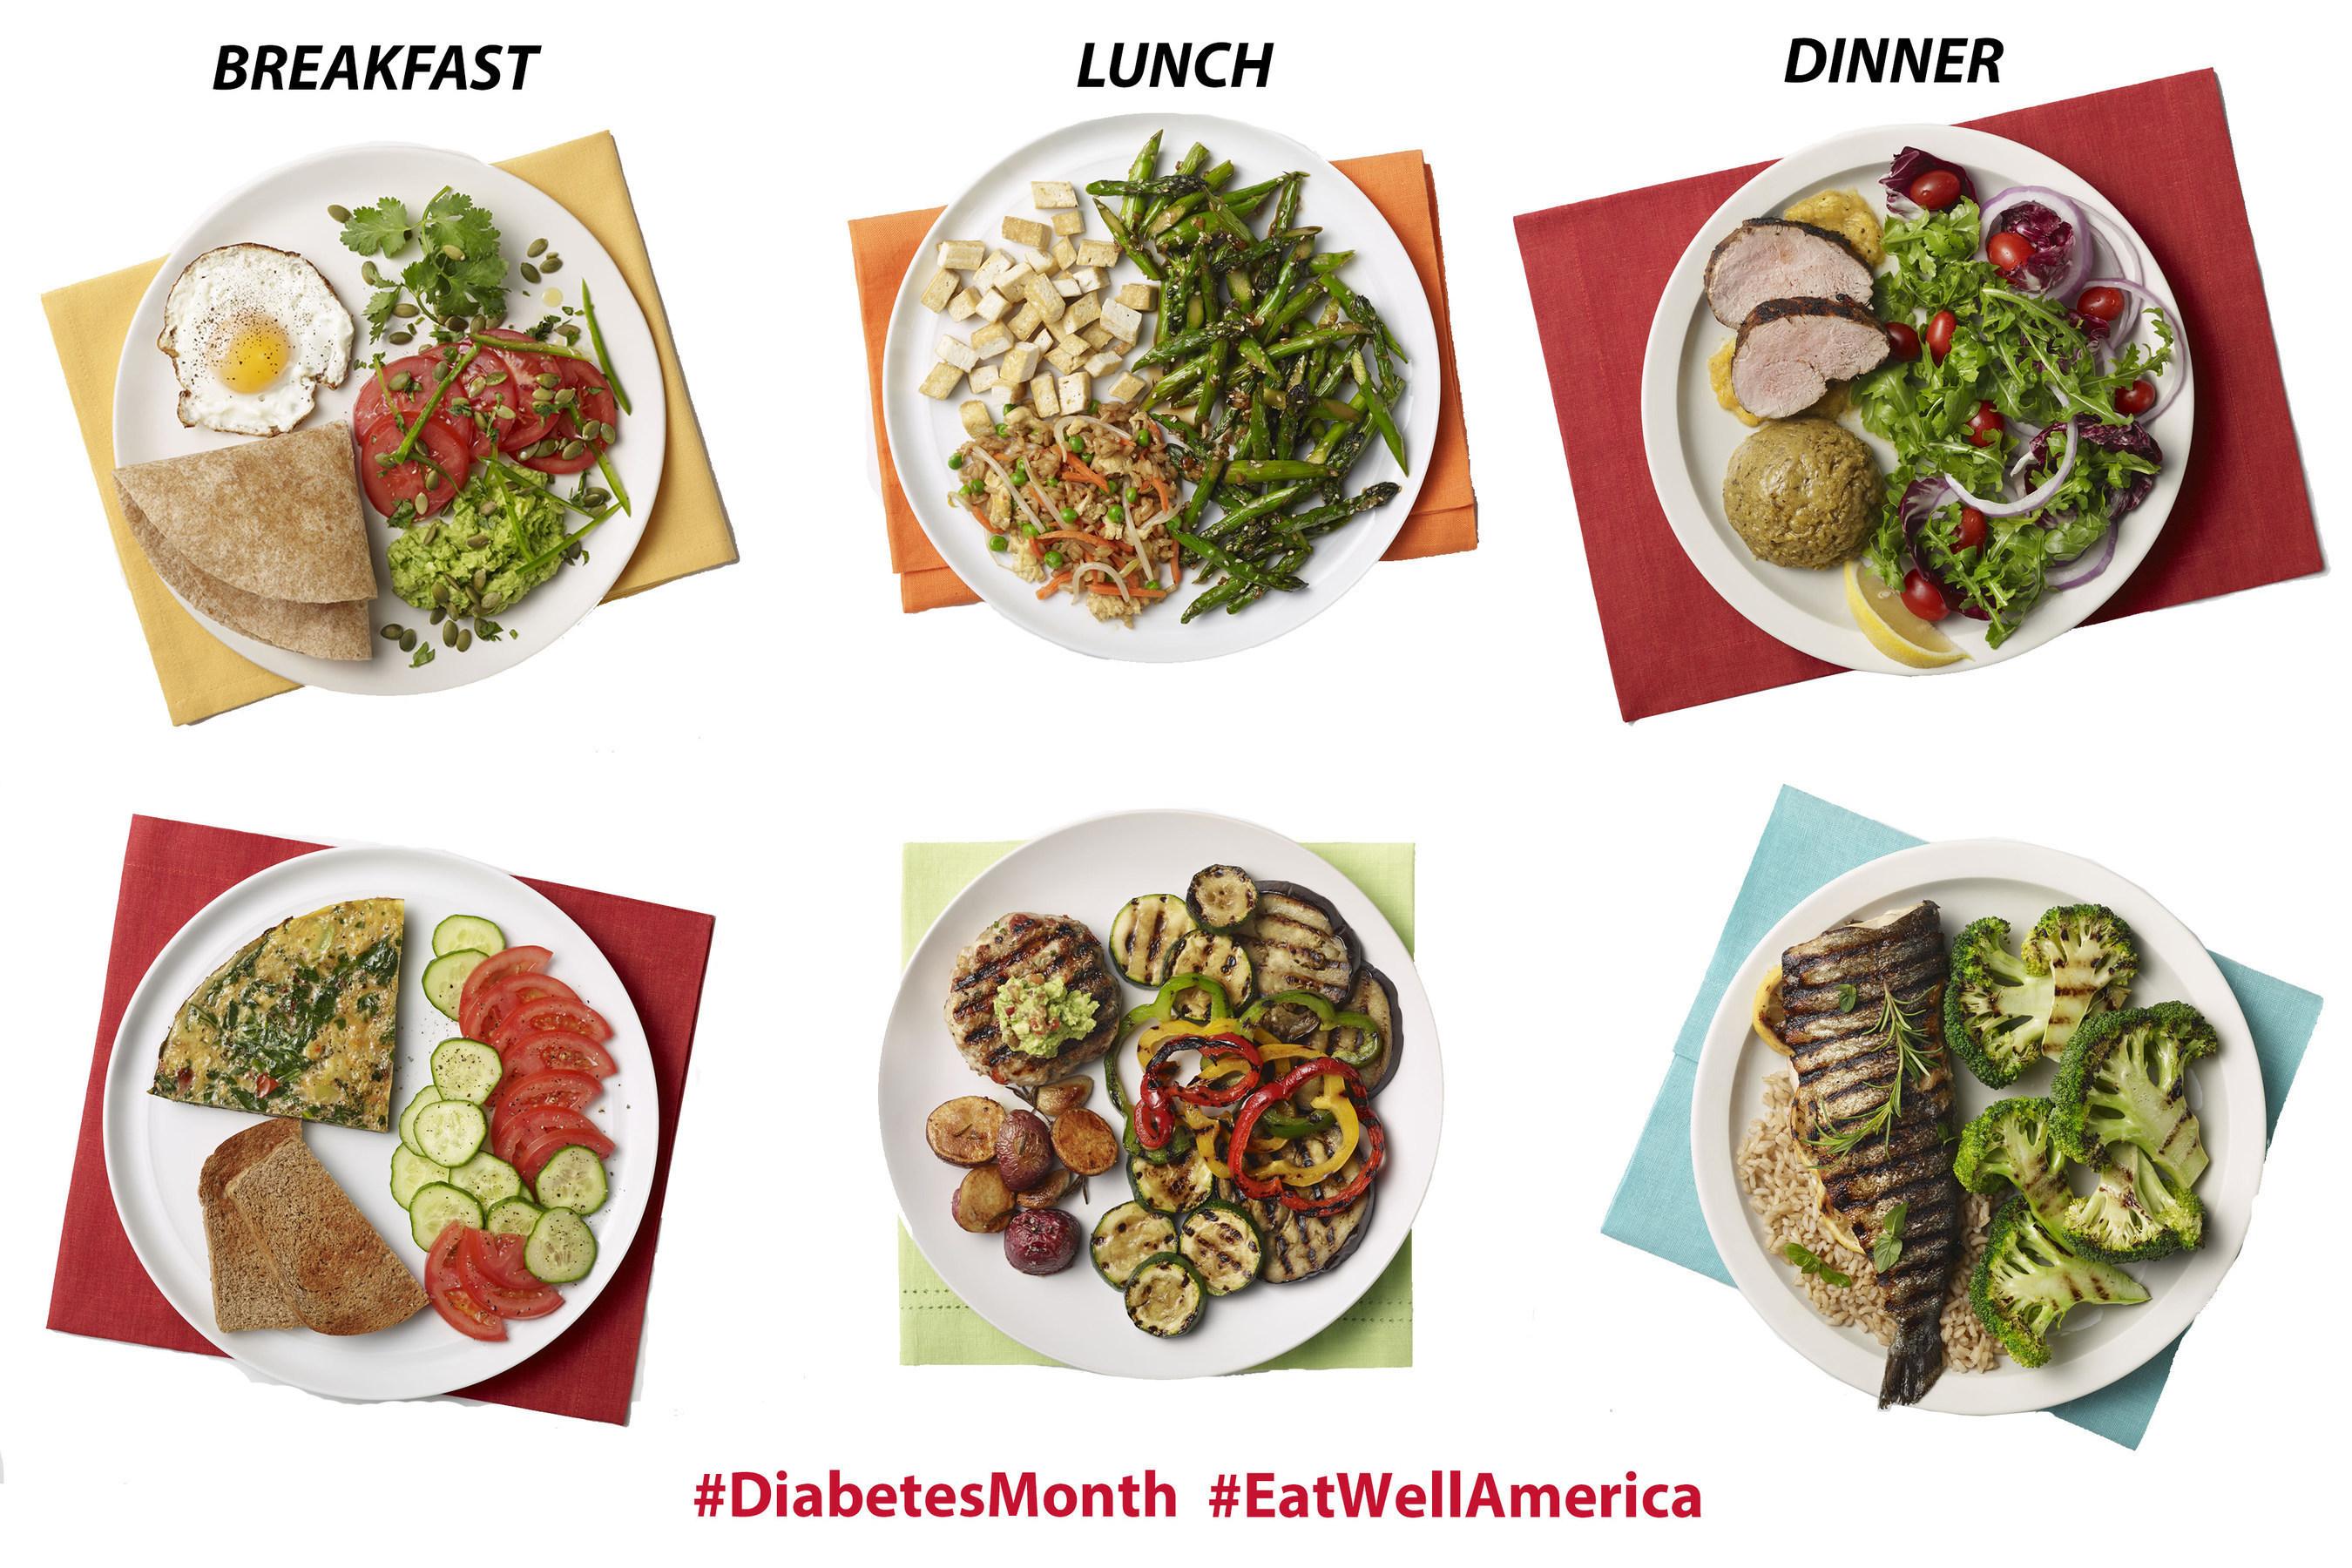 American Diabetes Month: Eat Well, America!